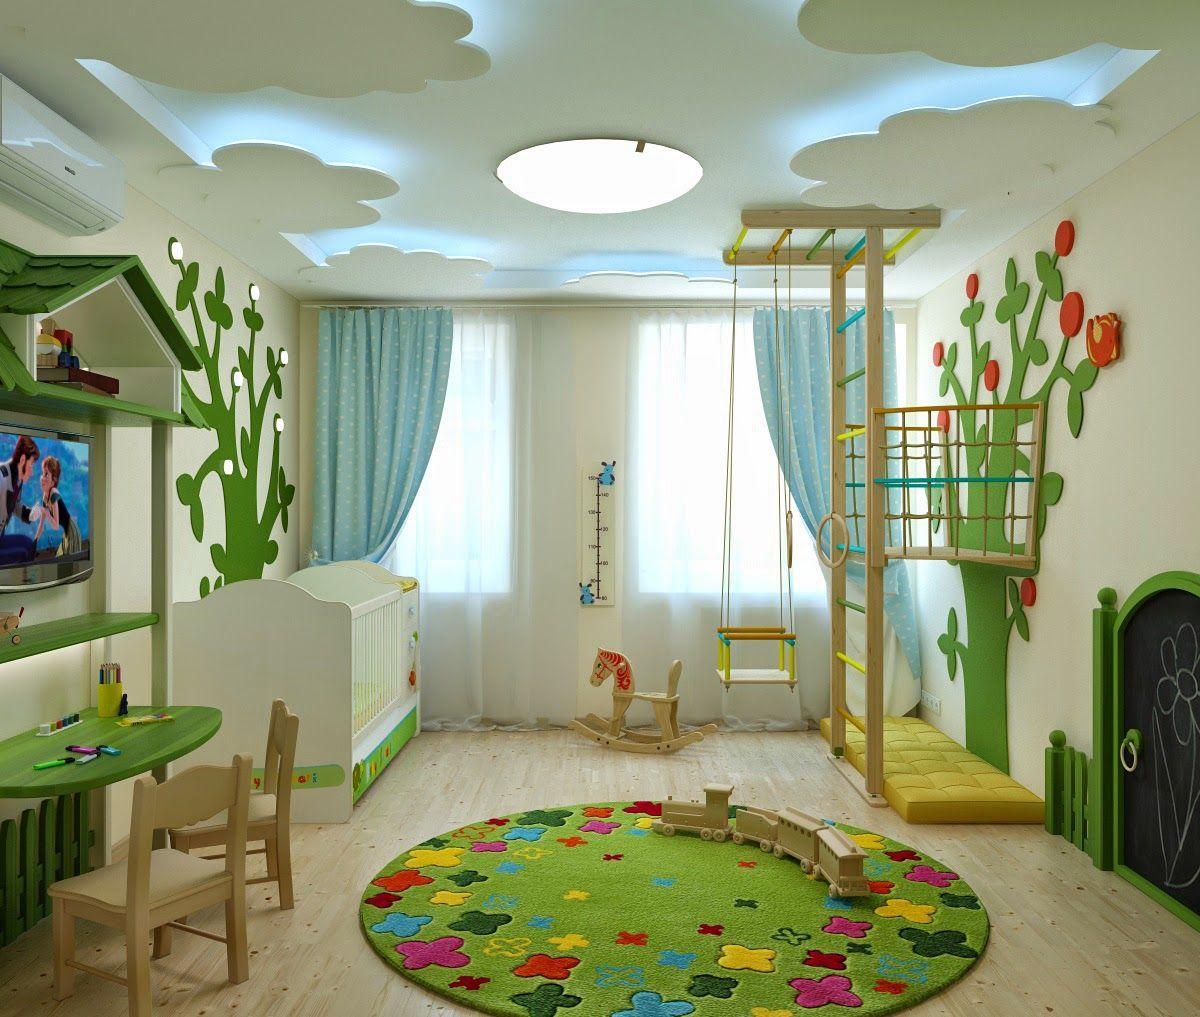 Kinder Traum Wald Kinderzimmer